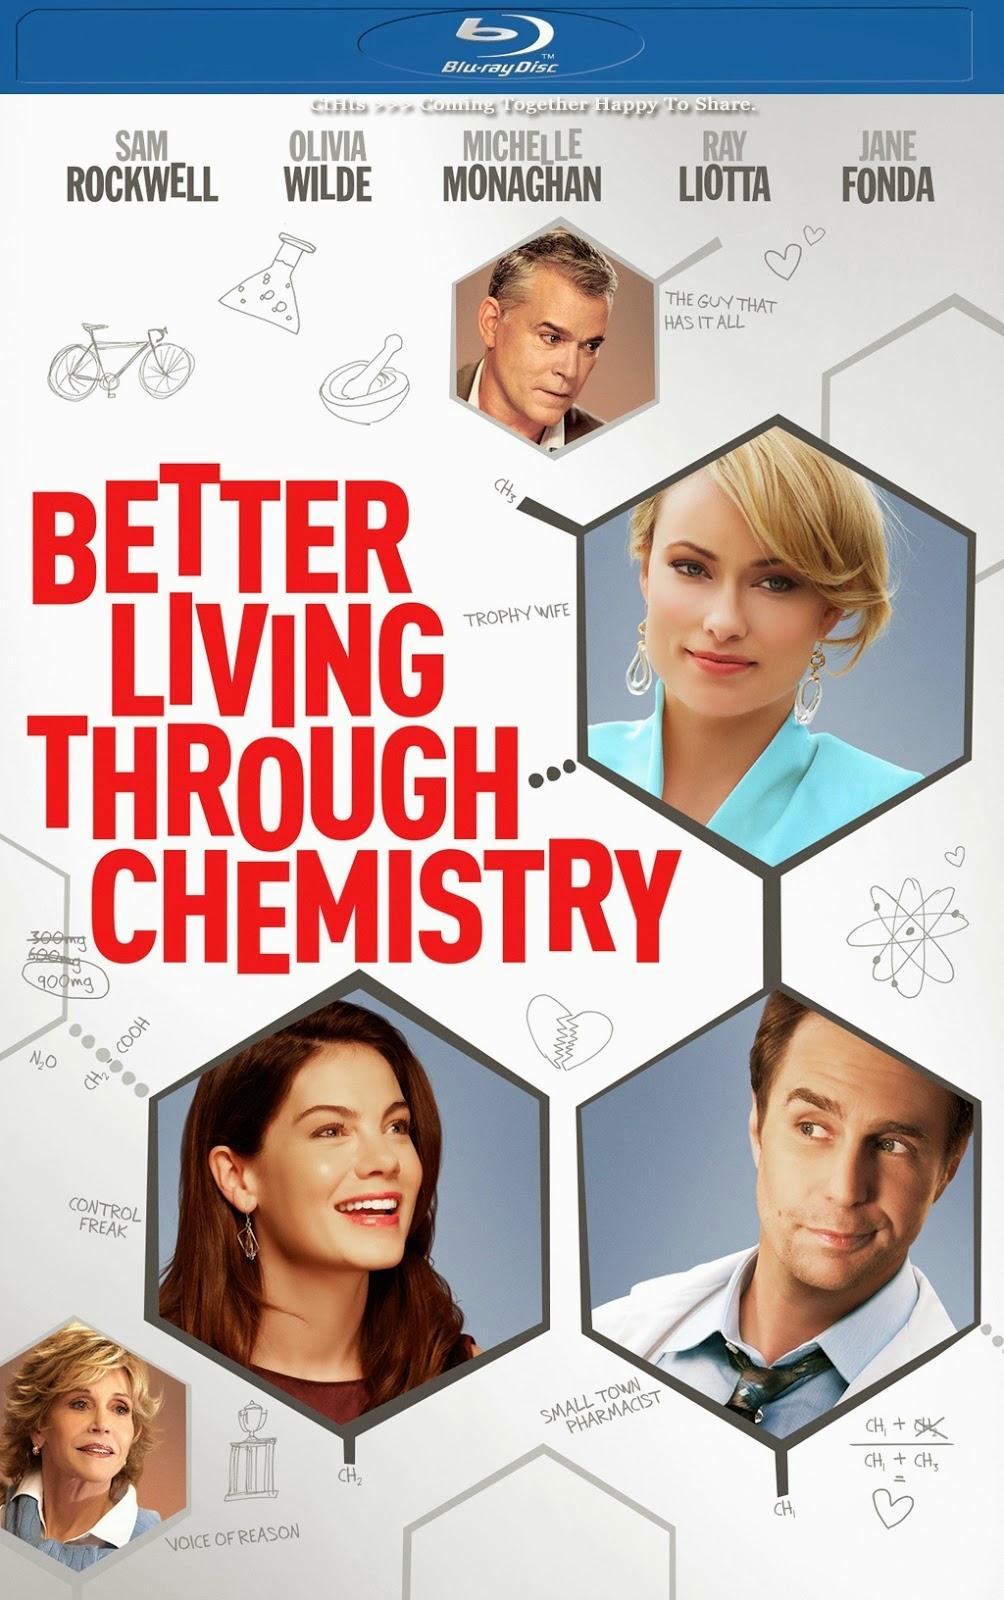 Better Living Through Chemistry (2014) : คู่กิ๊กเคมีลงล็อค